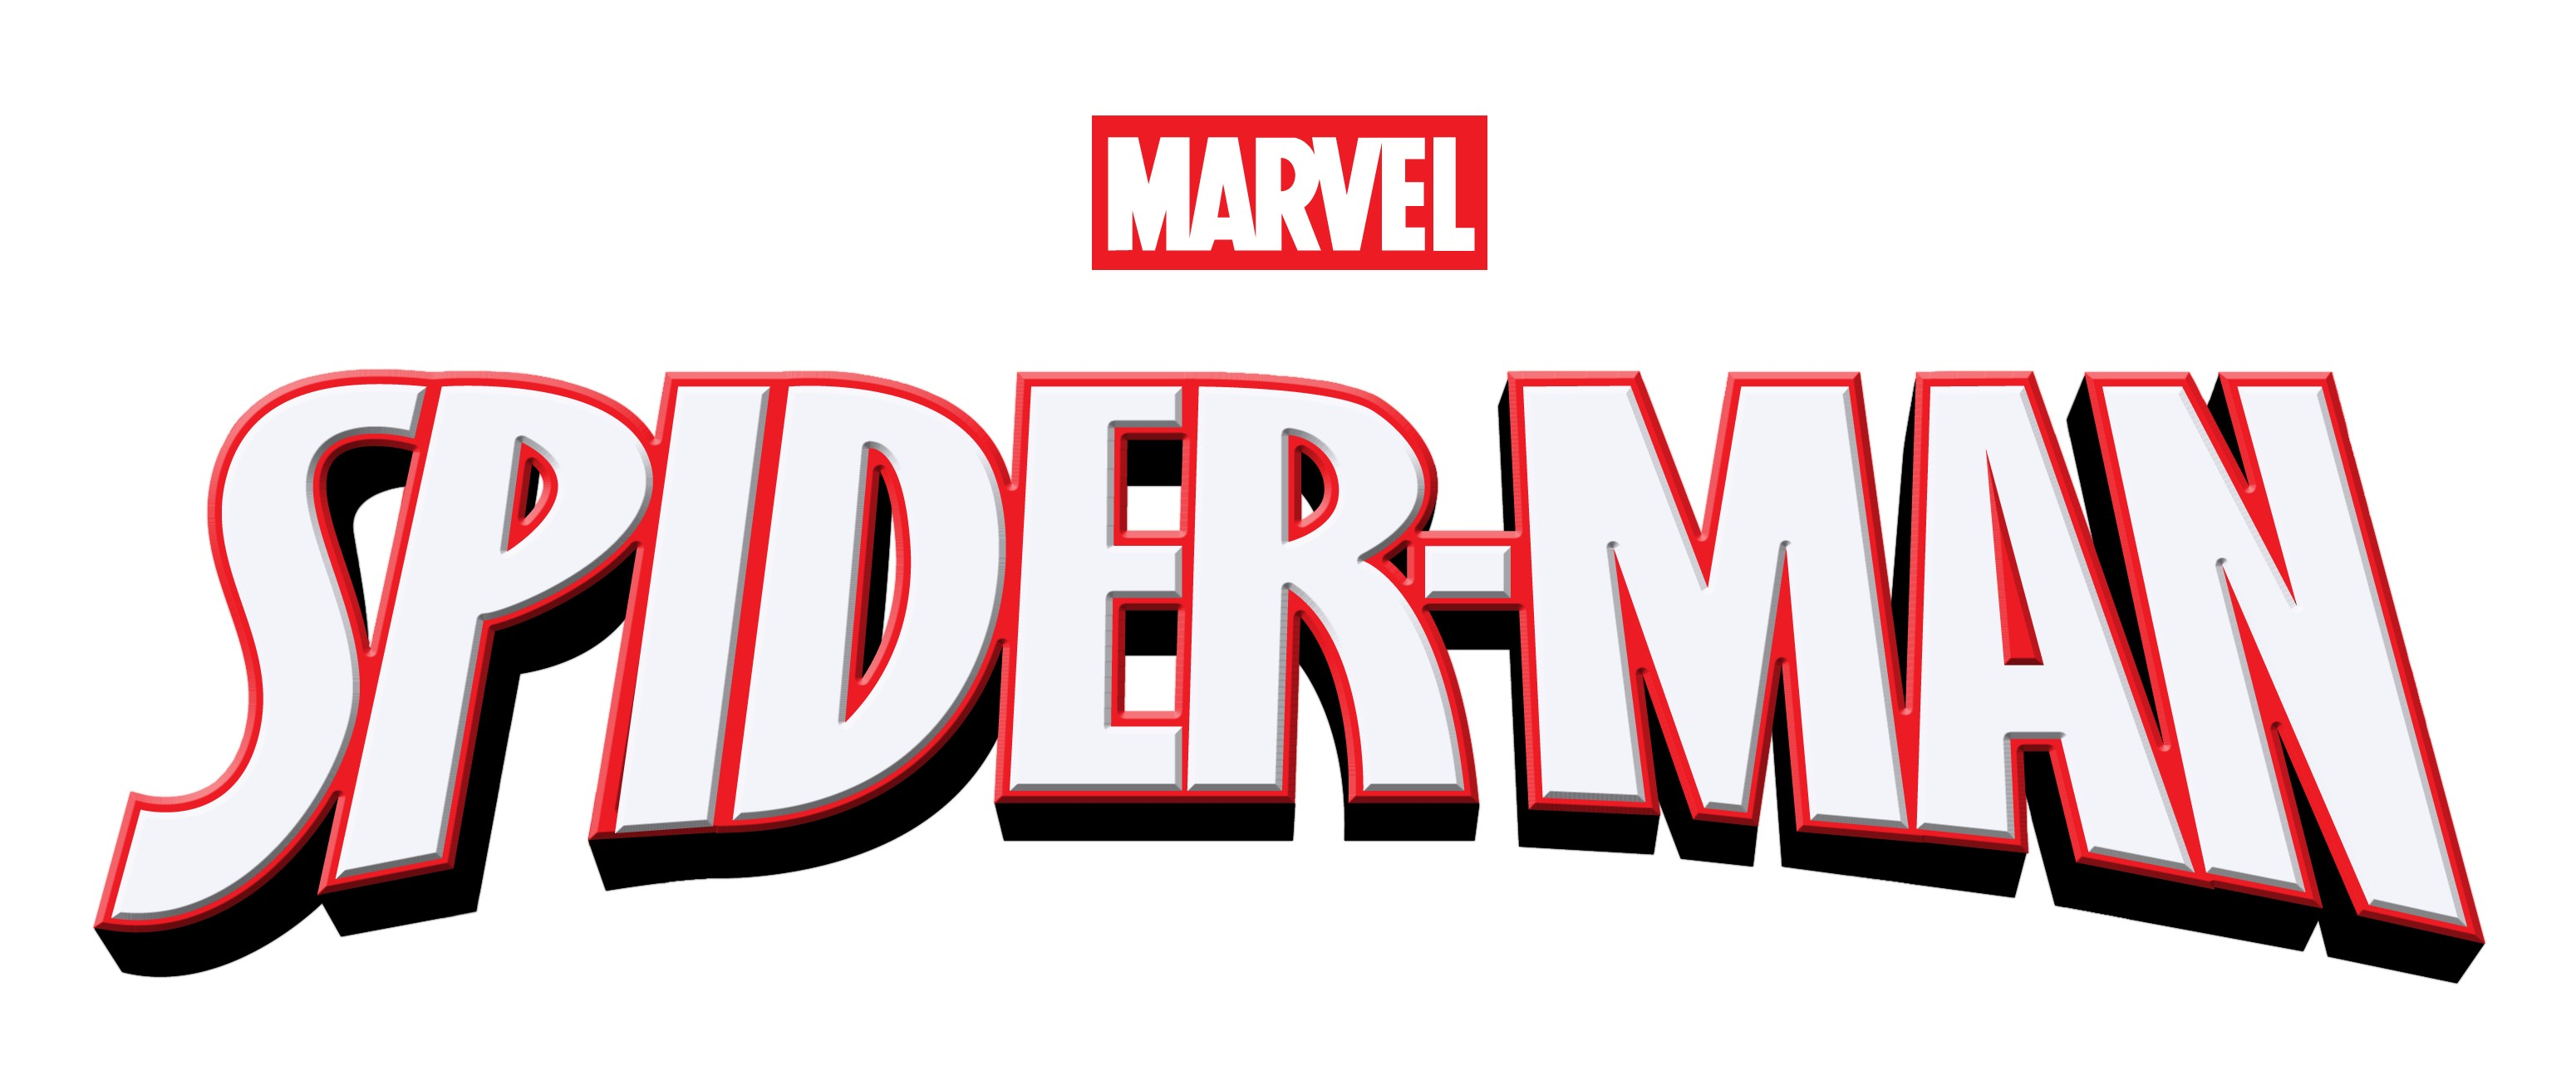 14 Spiderman